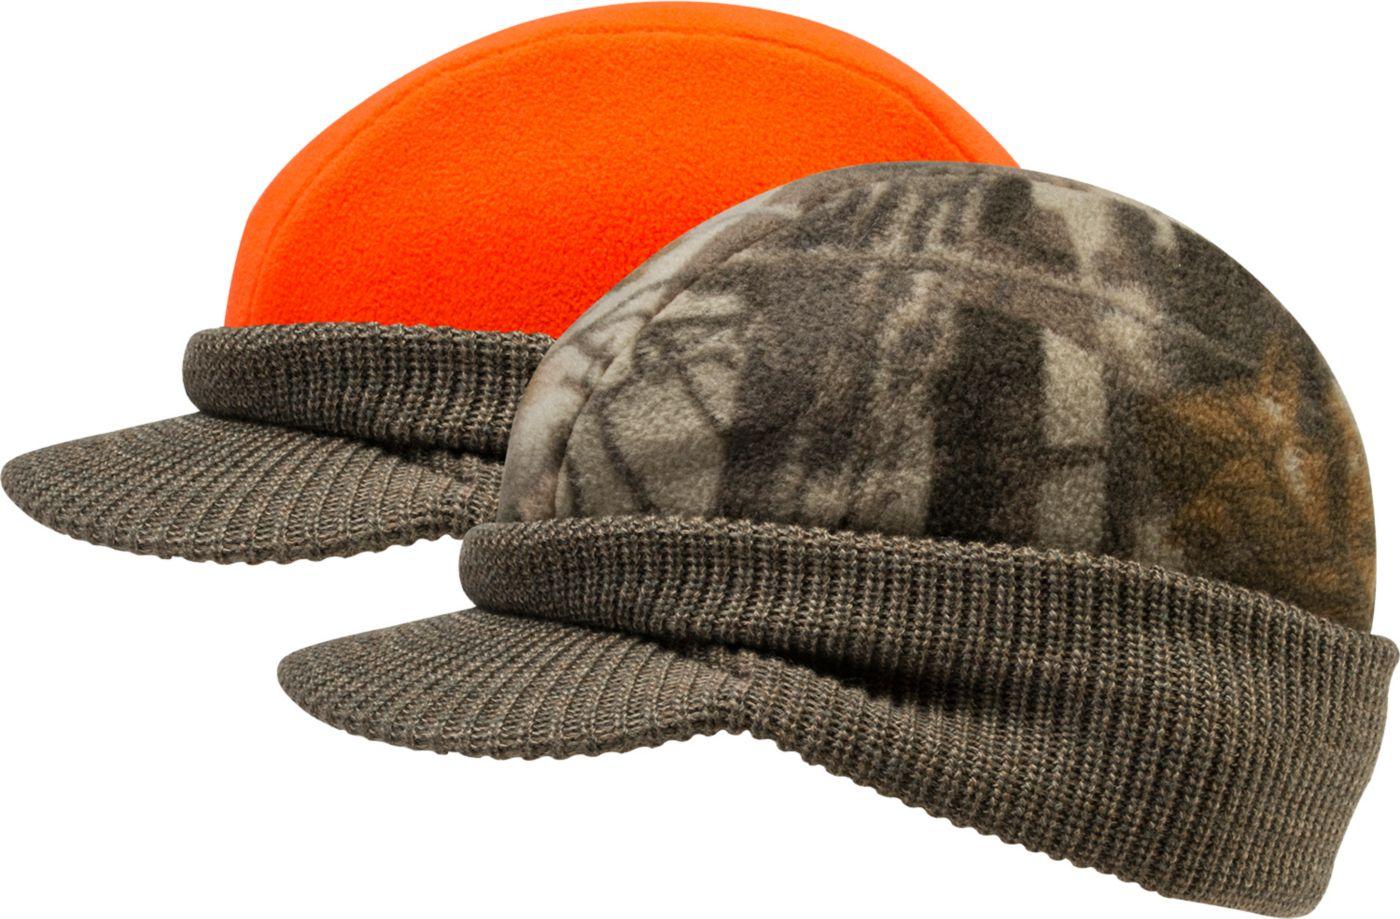 QuietWear Reversible Radar Hat